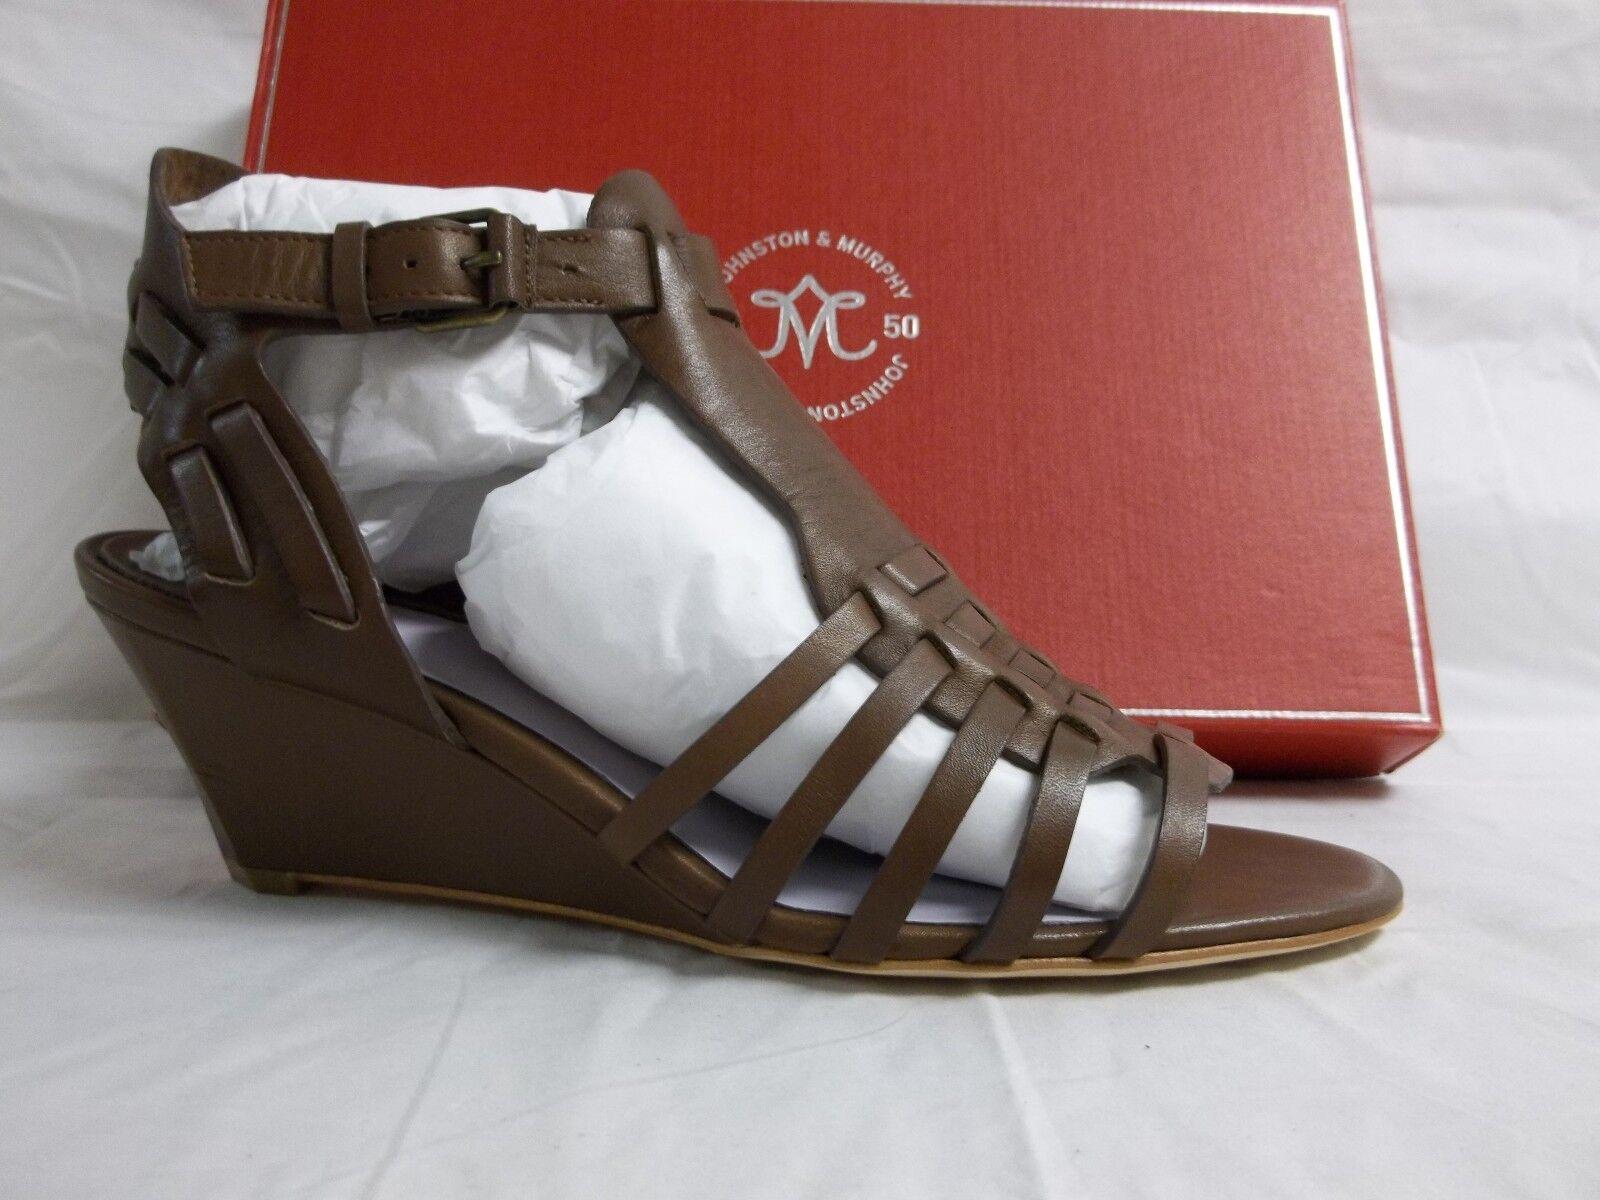 risparmia fino al 50% Johnston & Murphy Dimensione 7 M Kaye Kaye Kaye Cognac Leather Open Toe Wedges New donna scarpe  grande vendita